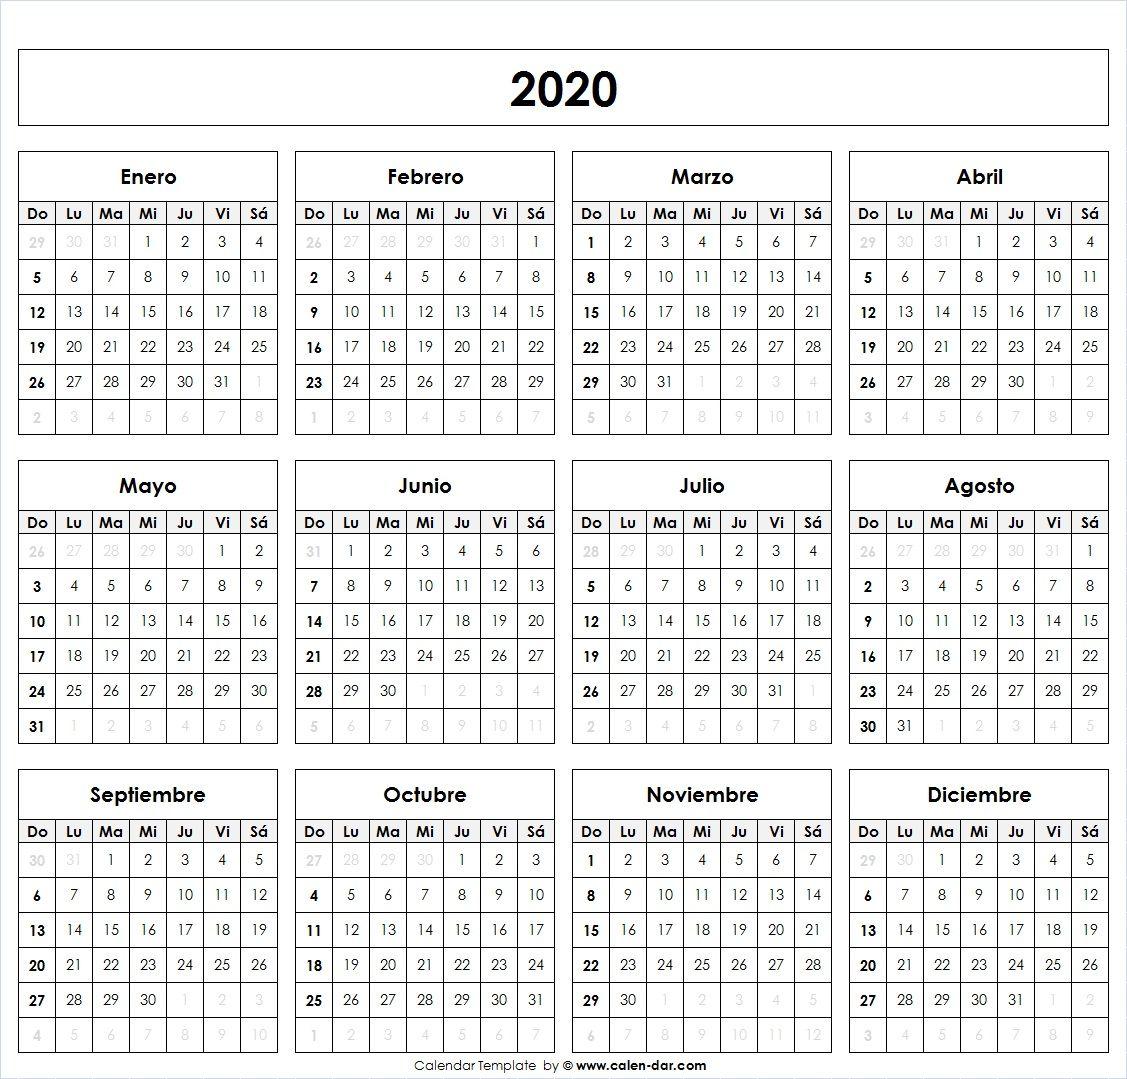 Calendario Chile 2020.Calendario 2020 Calendarios Calendario En Blanco